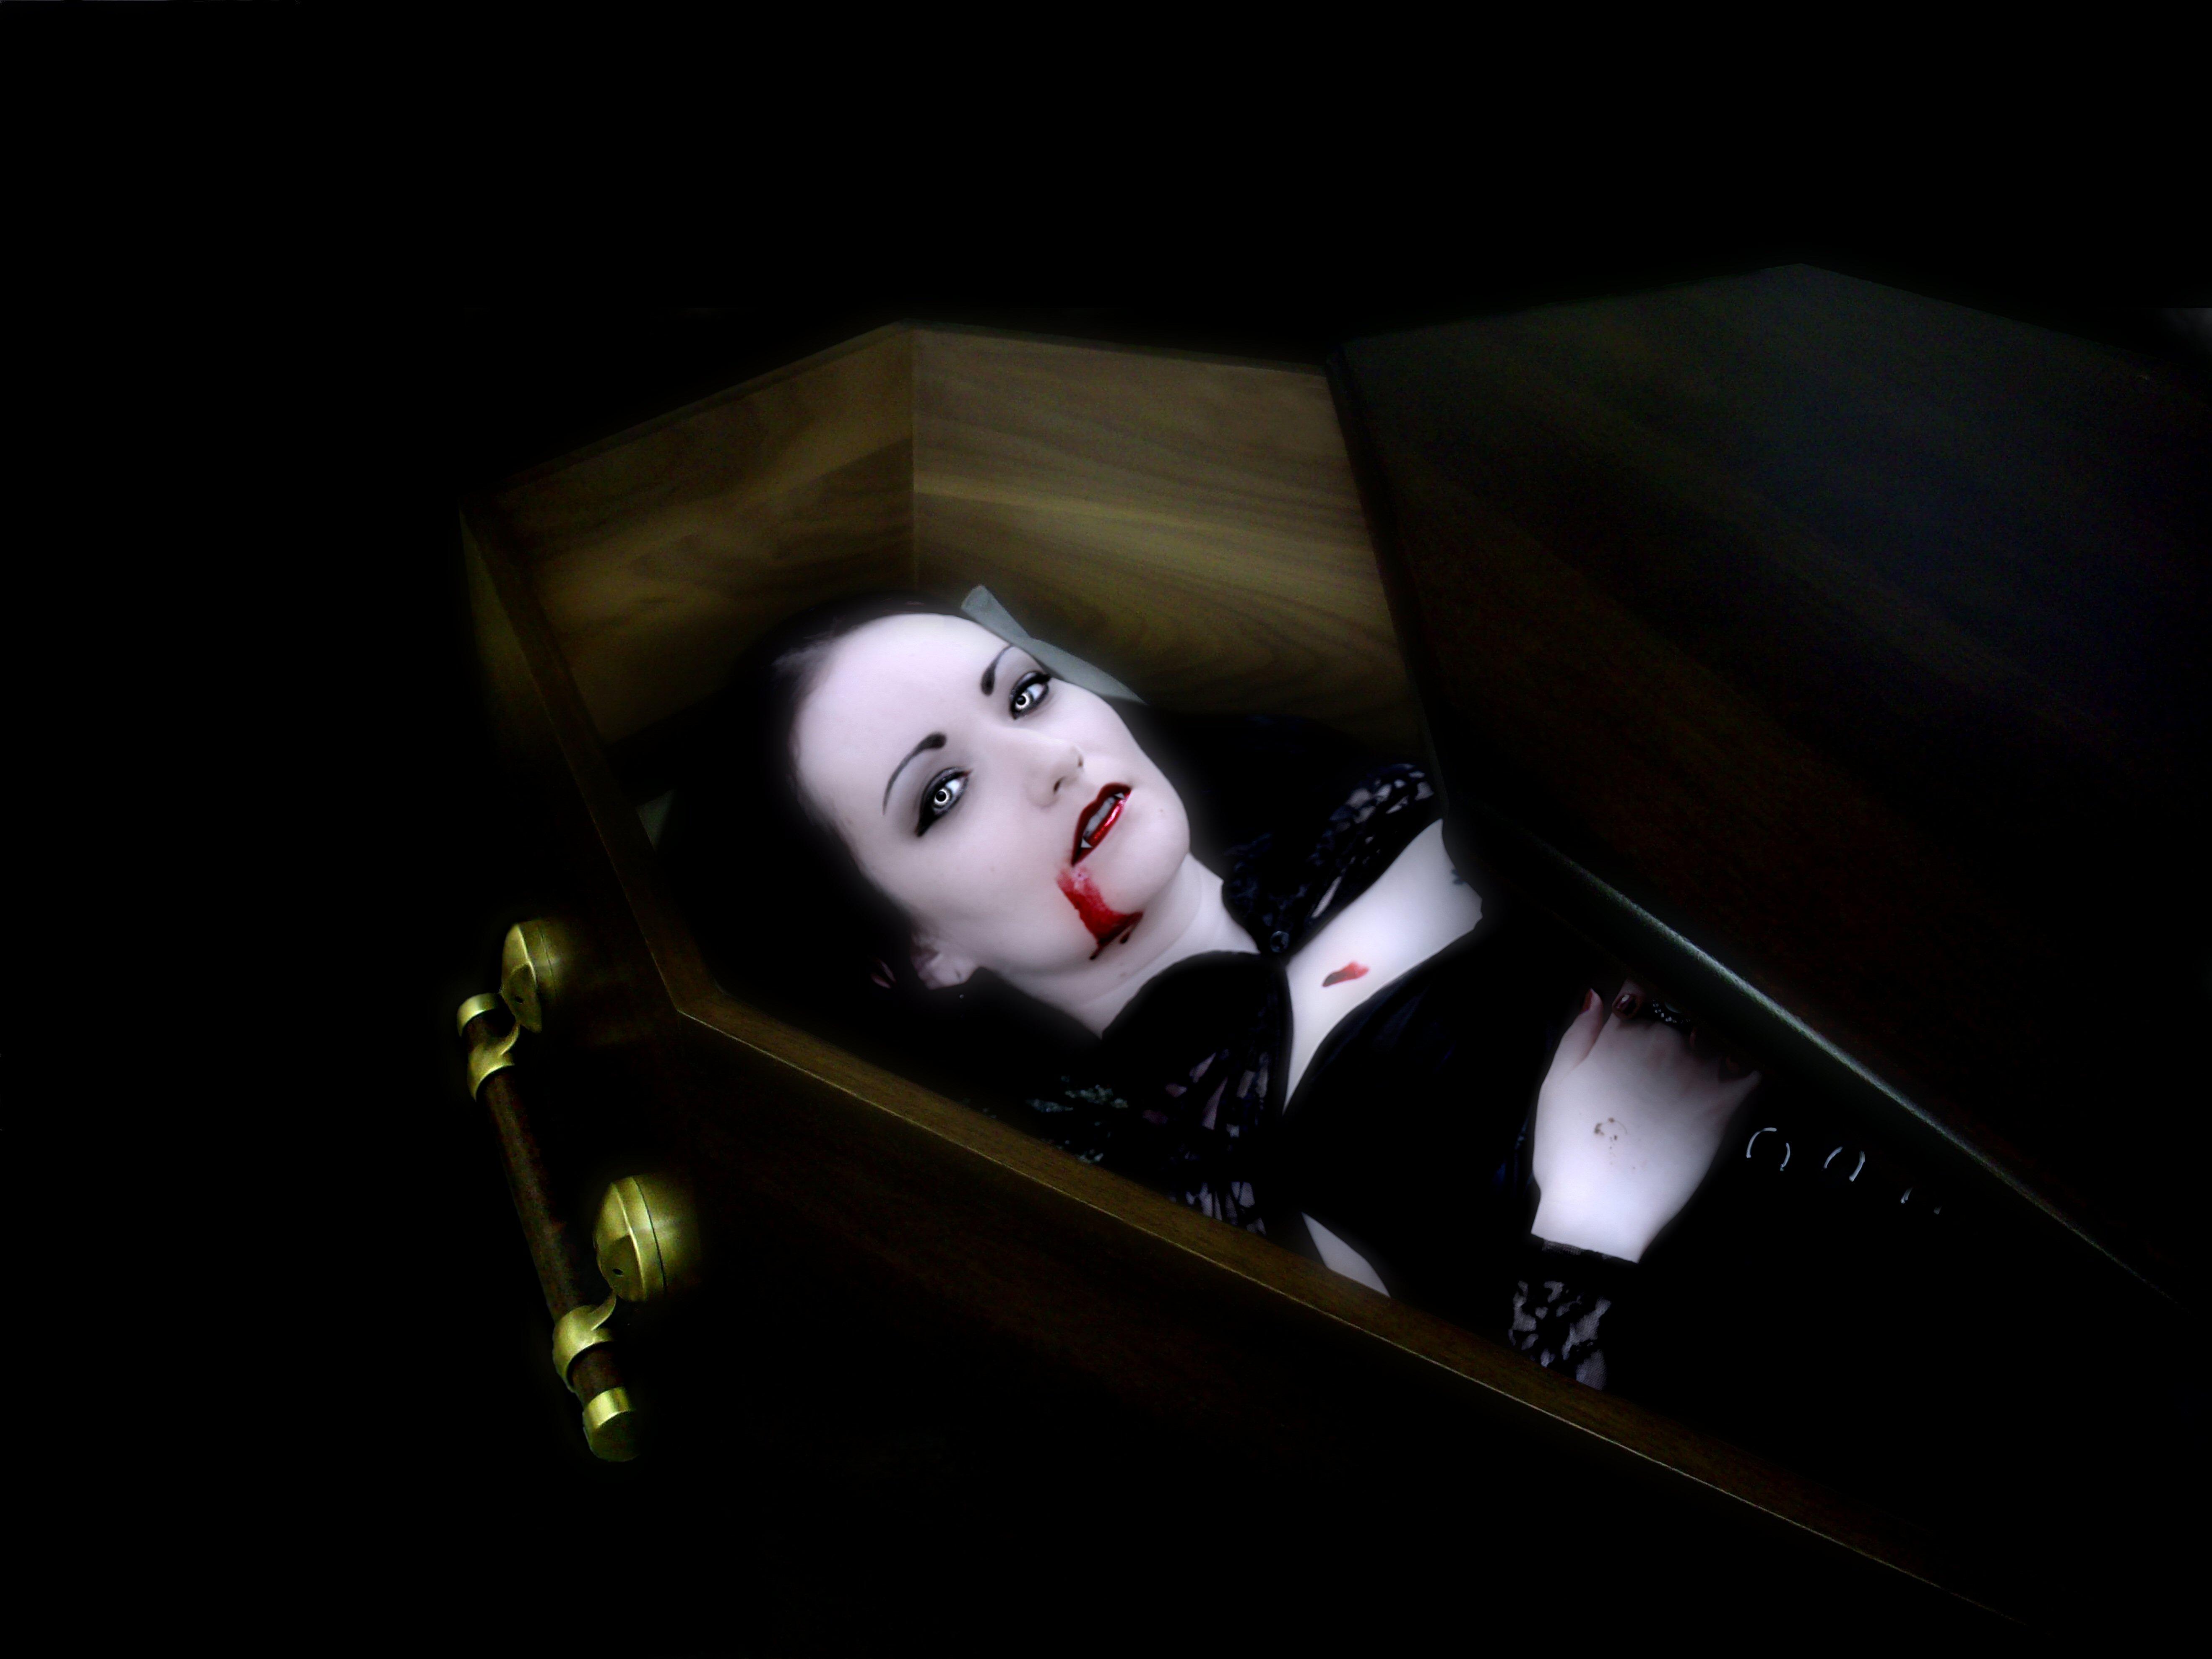 Fucked Dead Women In A Coffin Videos - Free Porn Videos